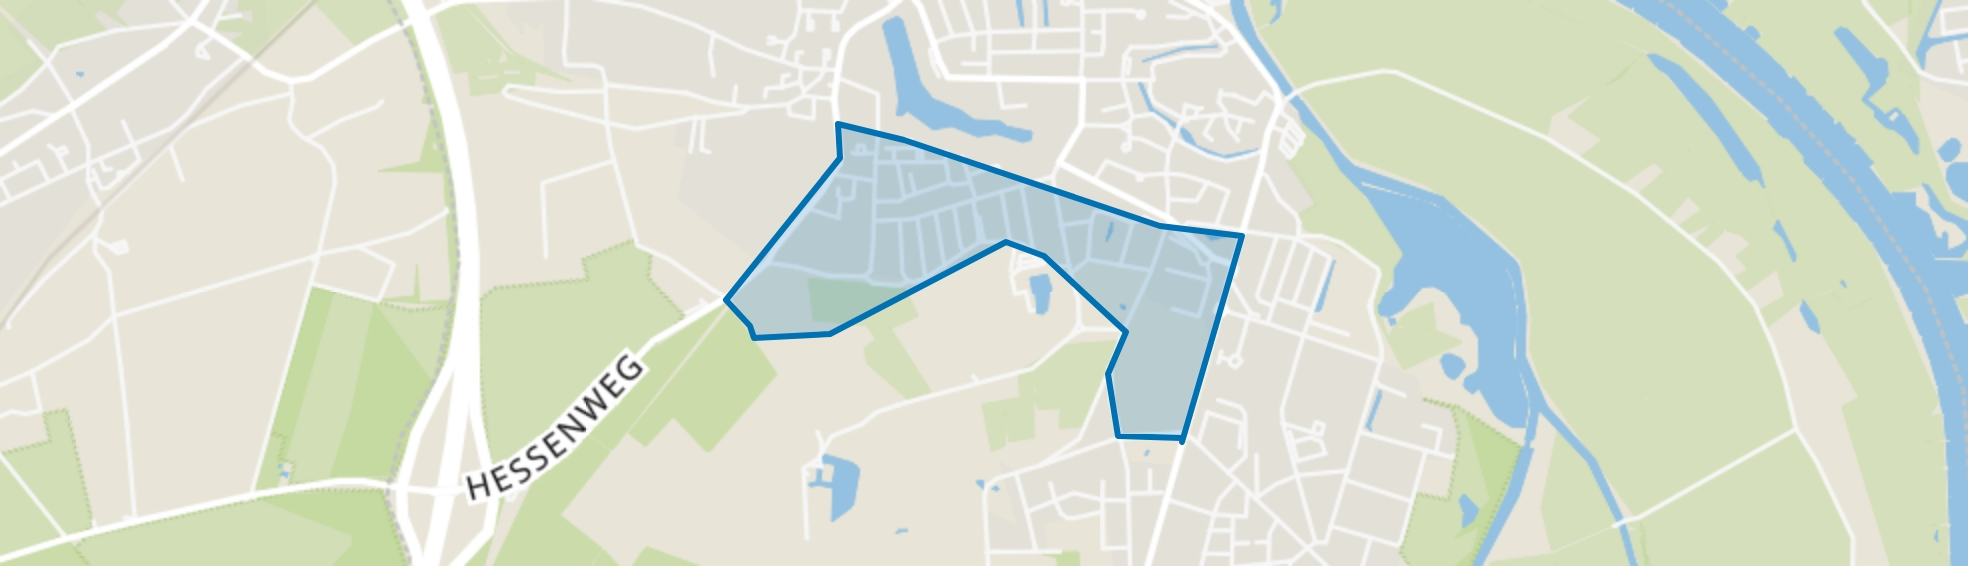 Hogenkamp en omgeving, Hattem map